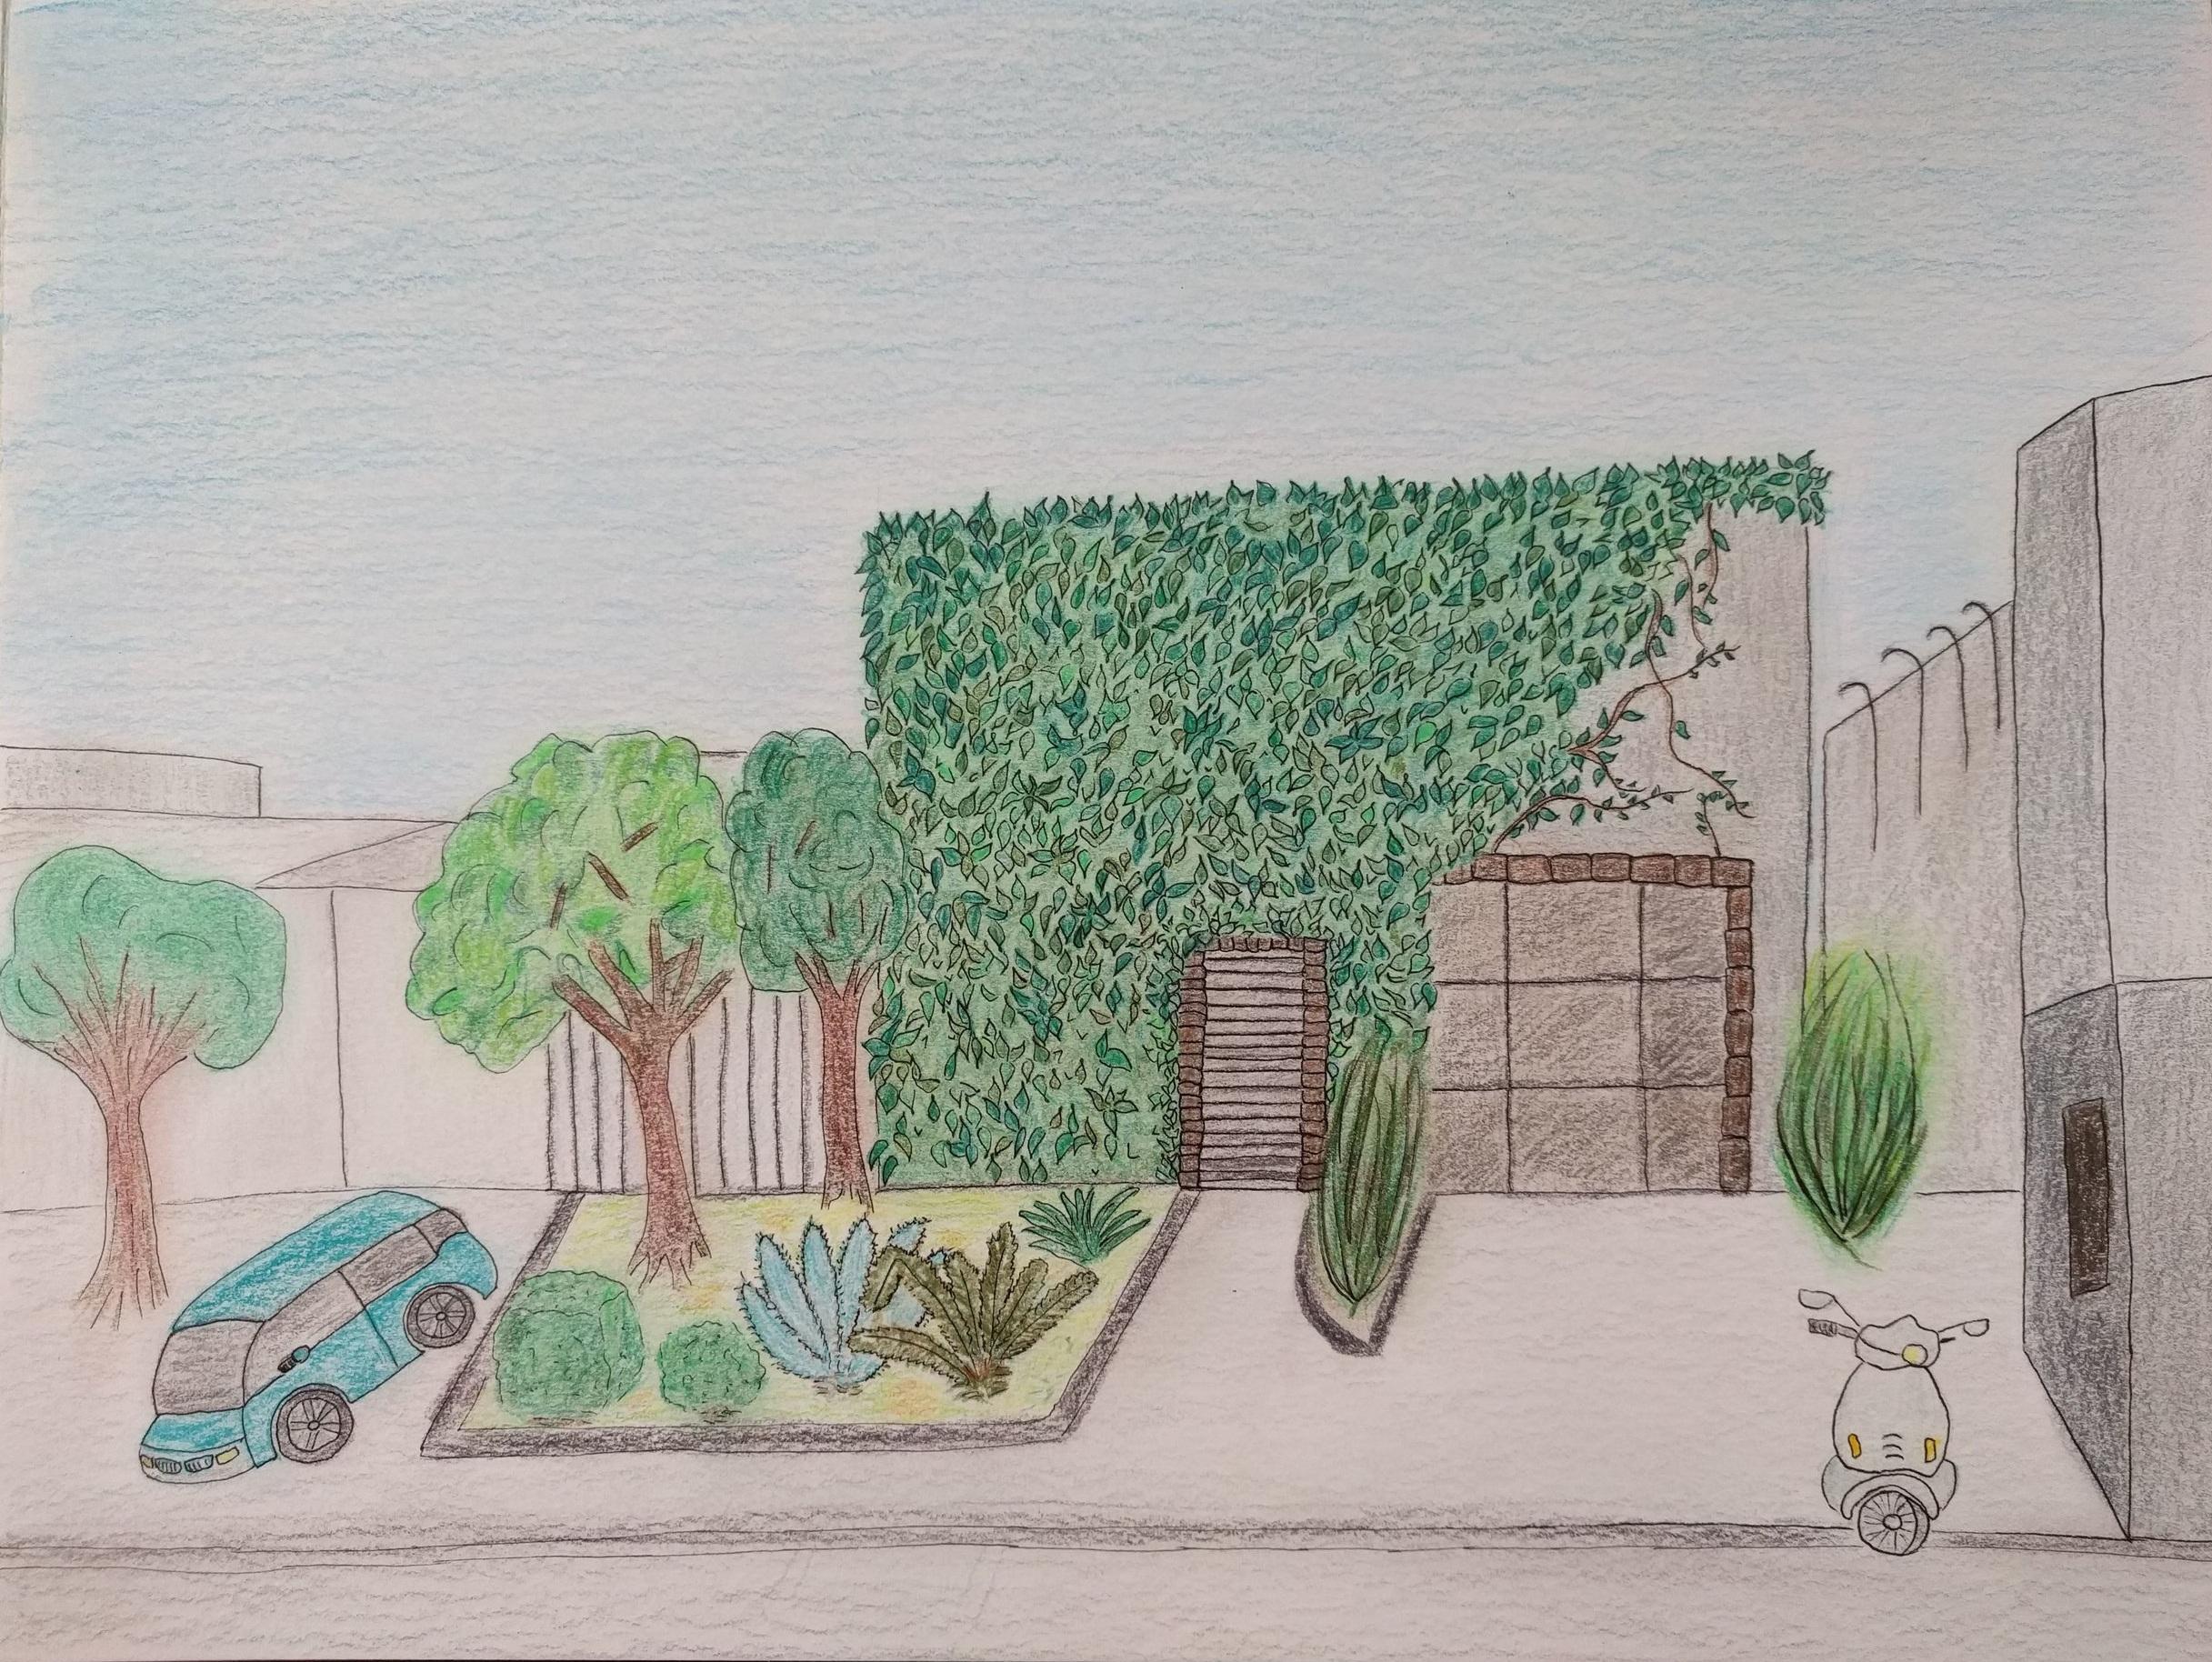 Urban Series. Culver City Vines